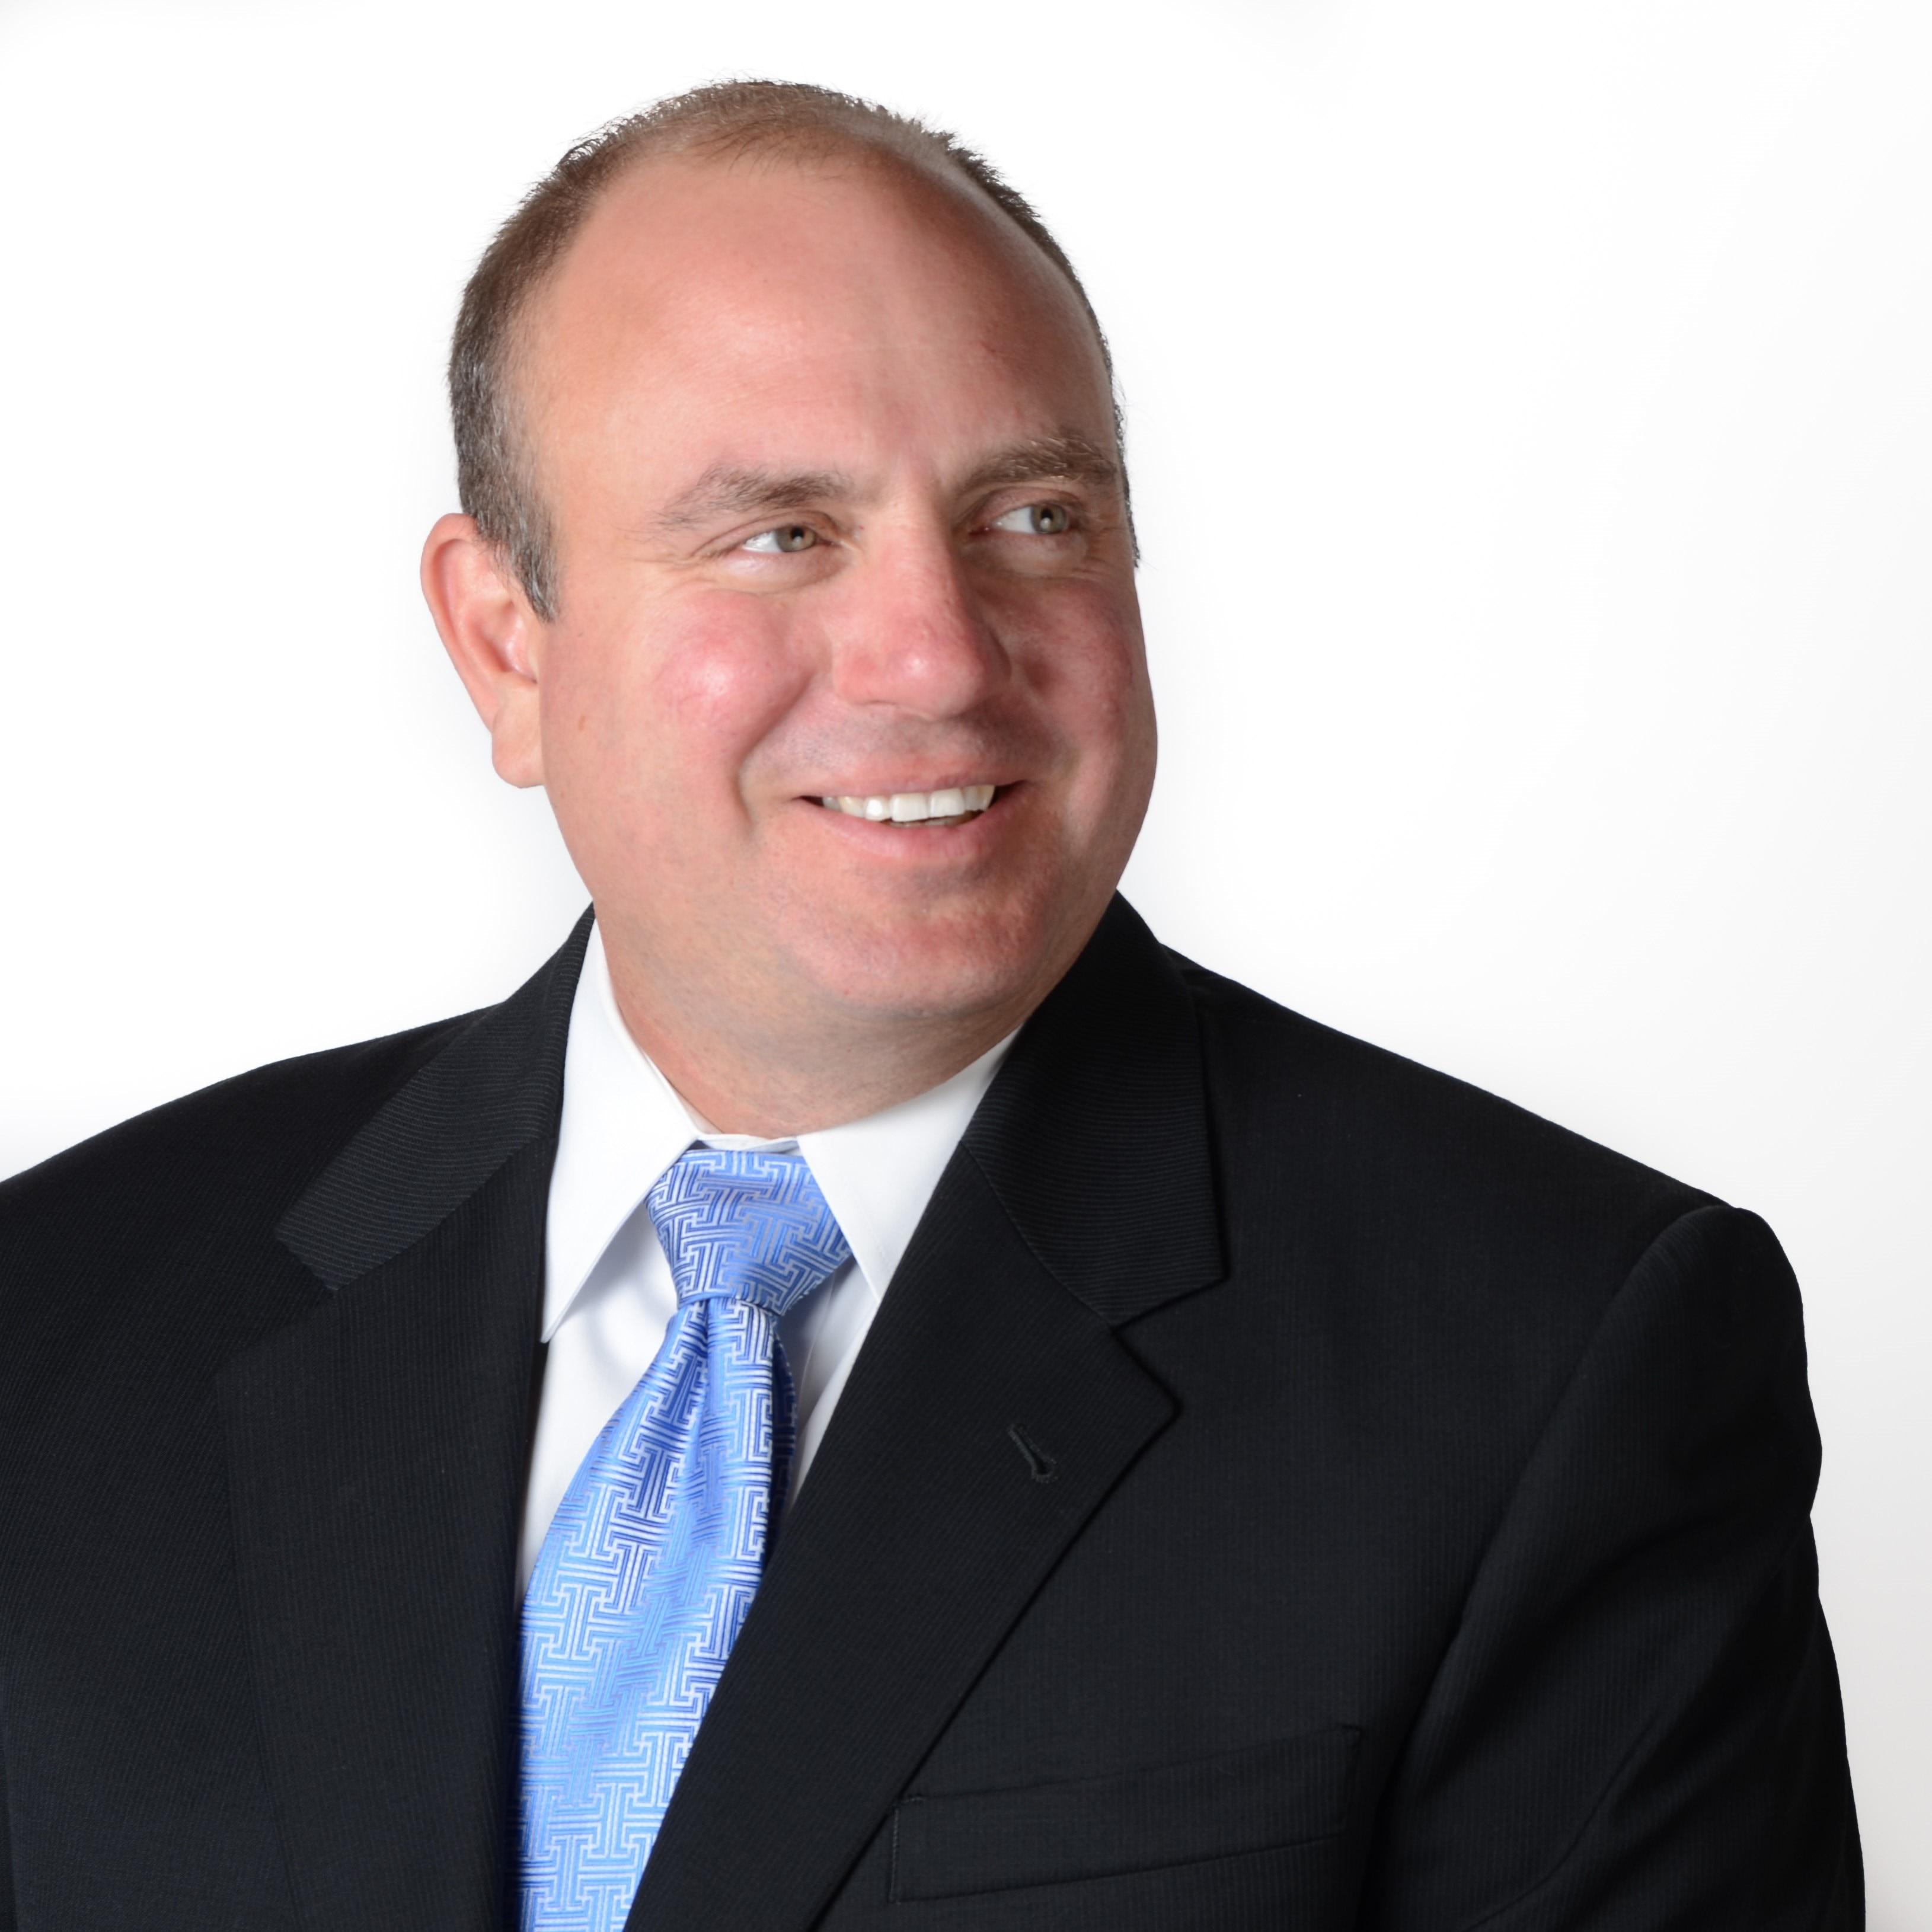 TIMOTHY J. POTJER  Your Financial Advisor